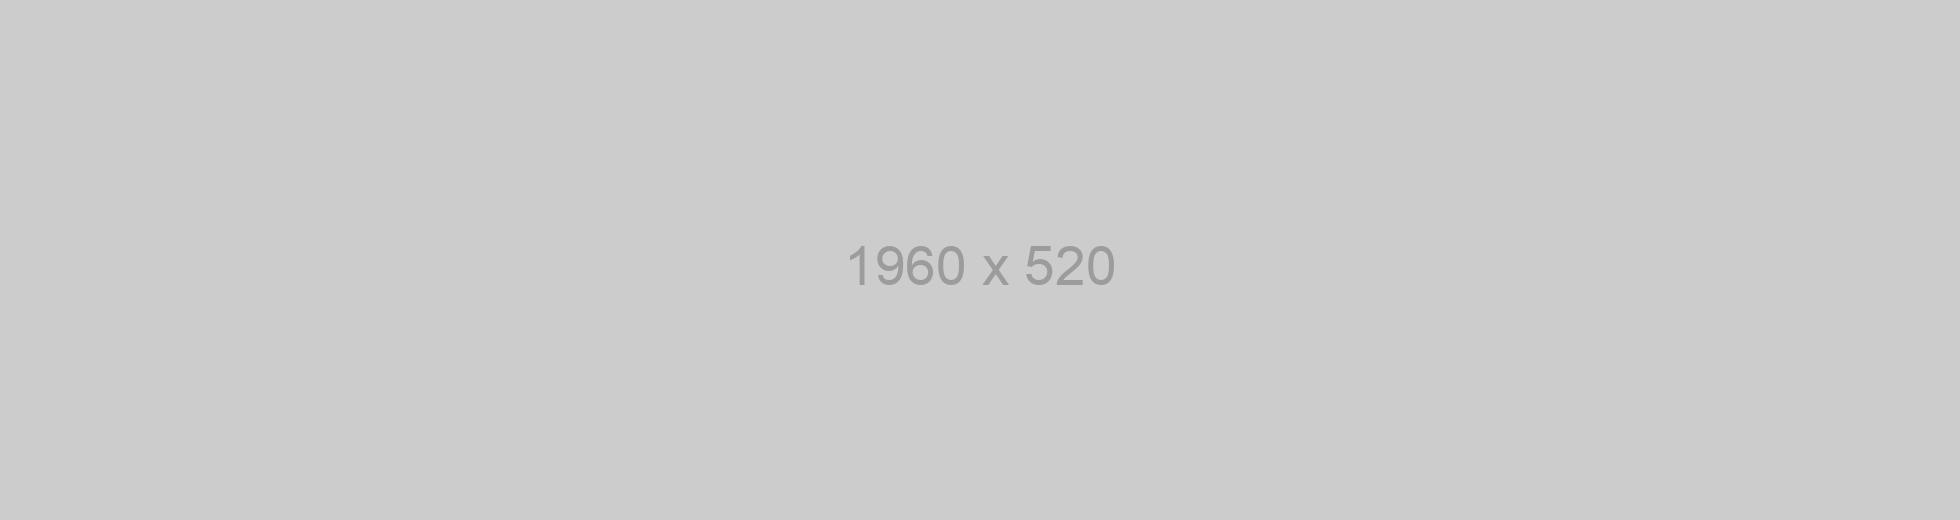 Header-image 1960x520px